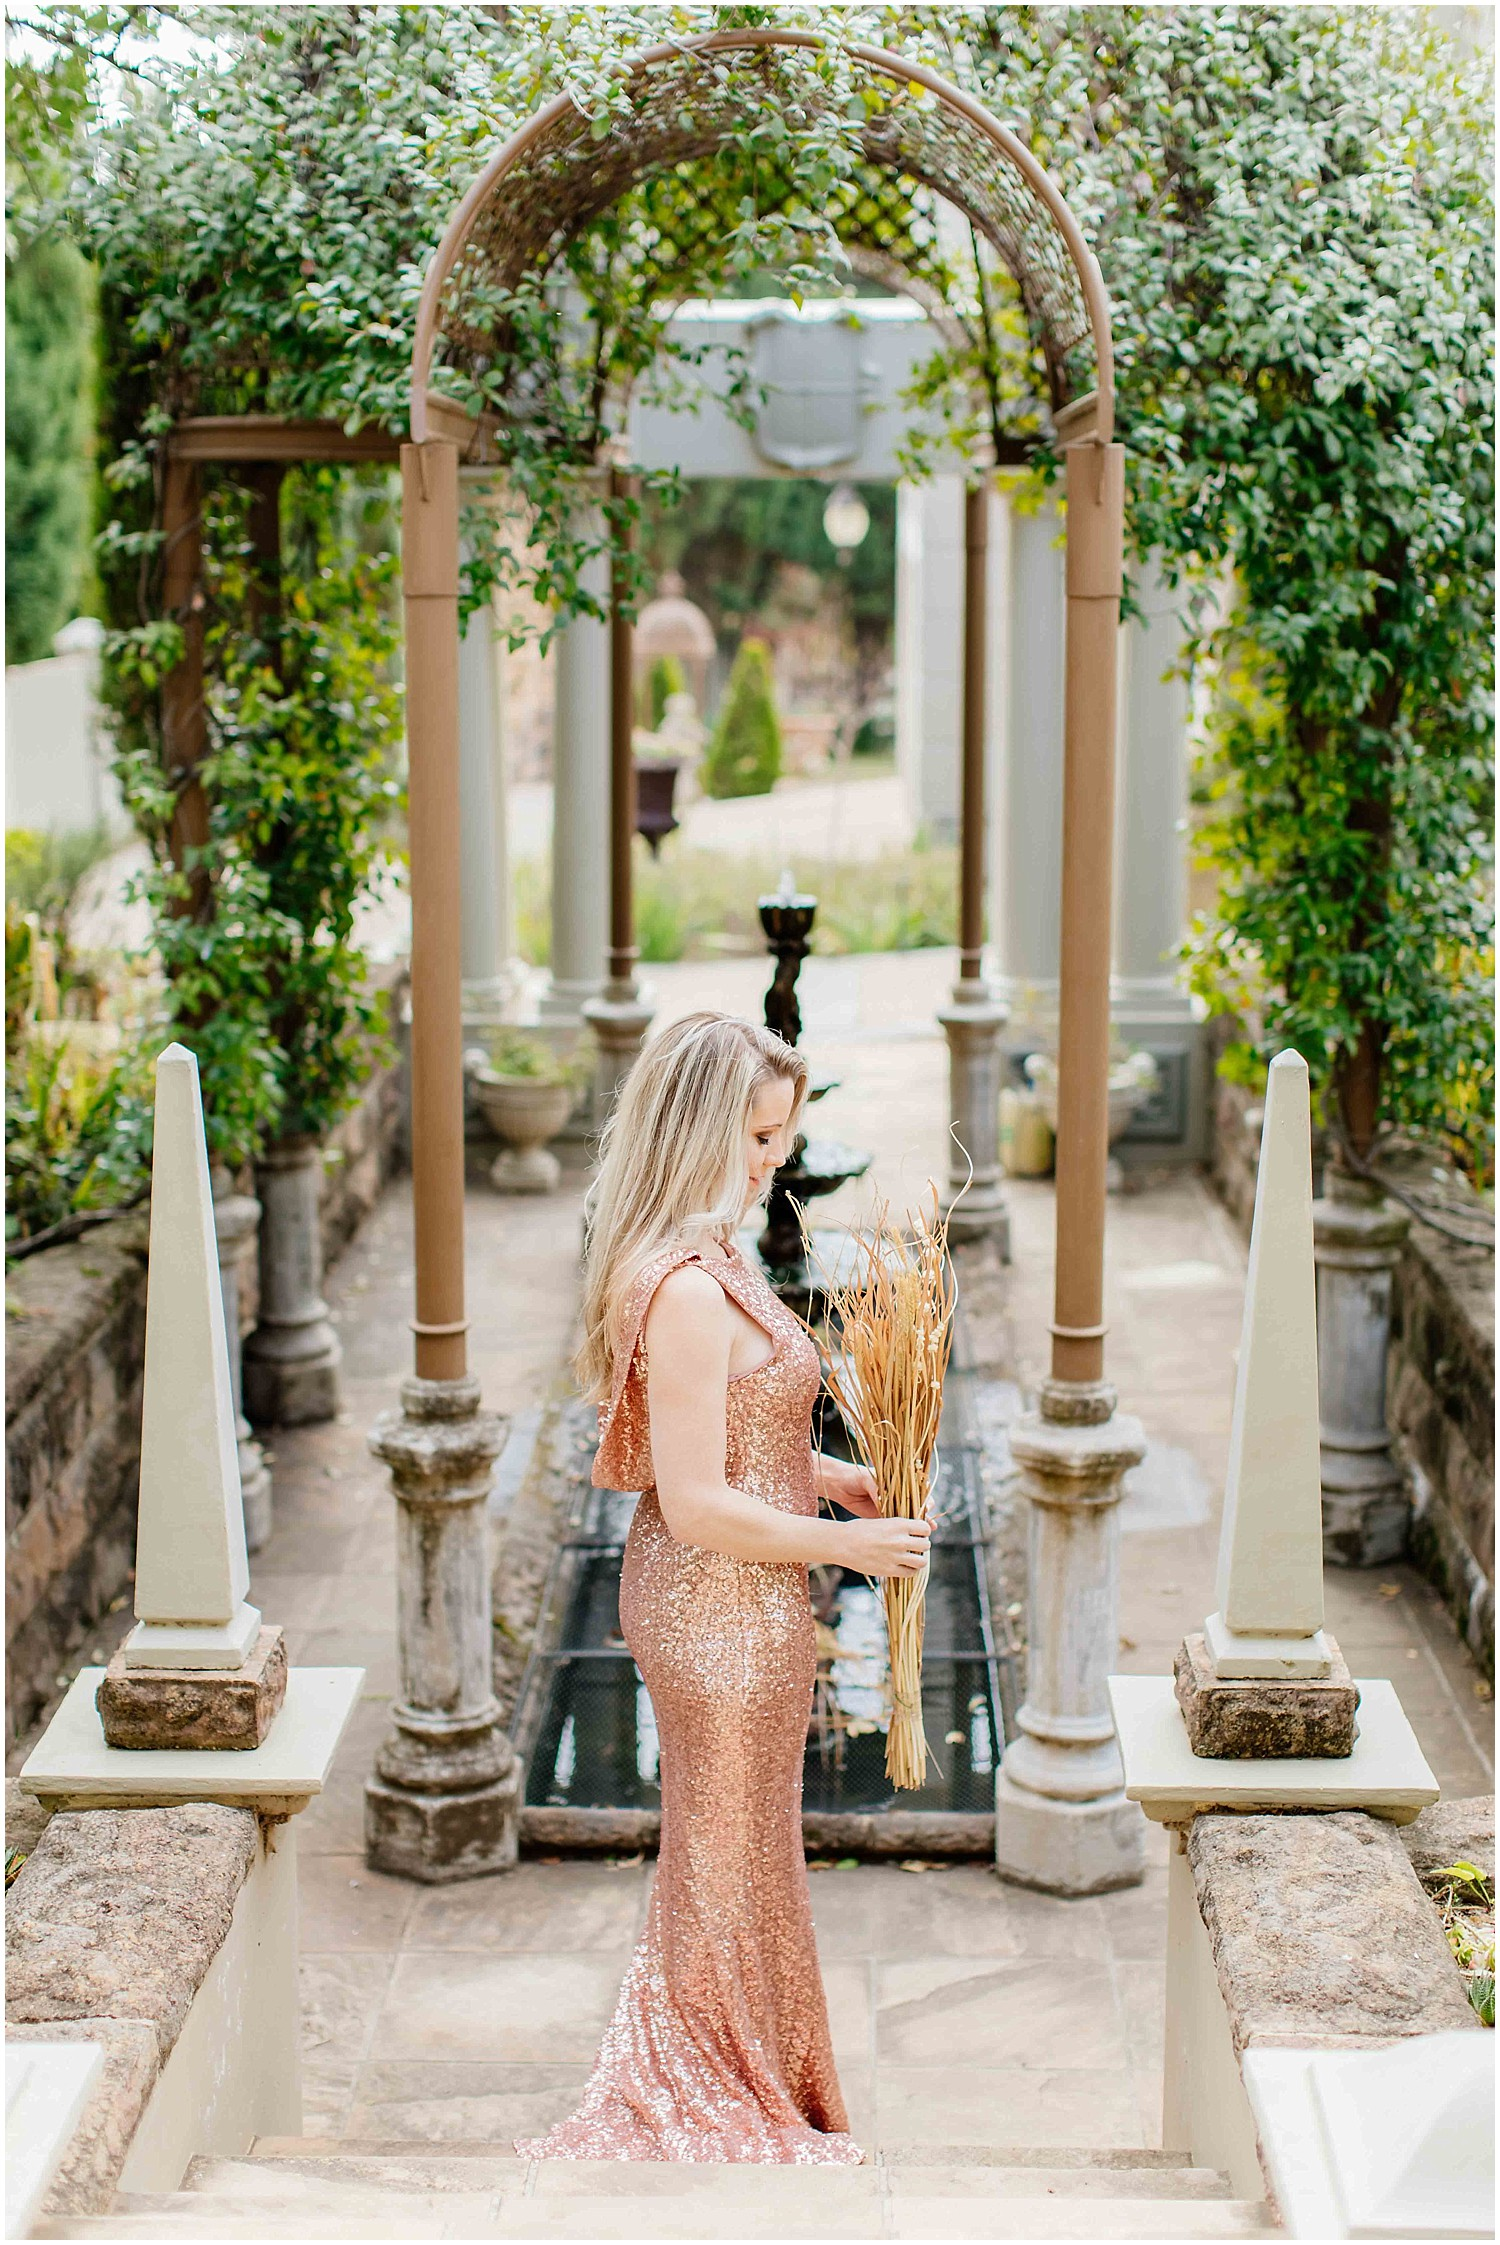 rolene-photography-cordelia-sangeres-engagement-shoot-parys_0021.jpg